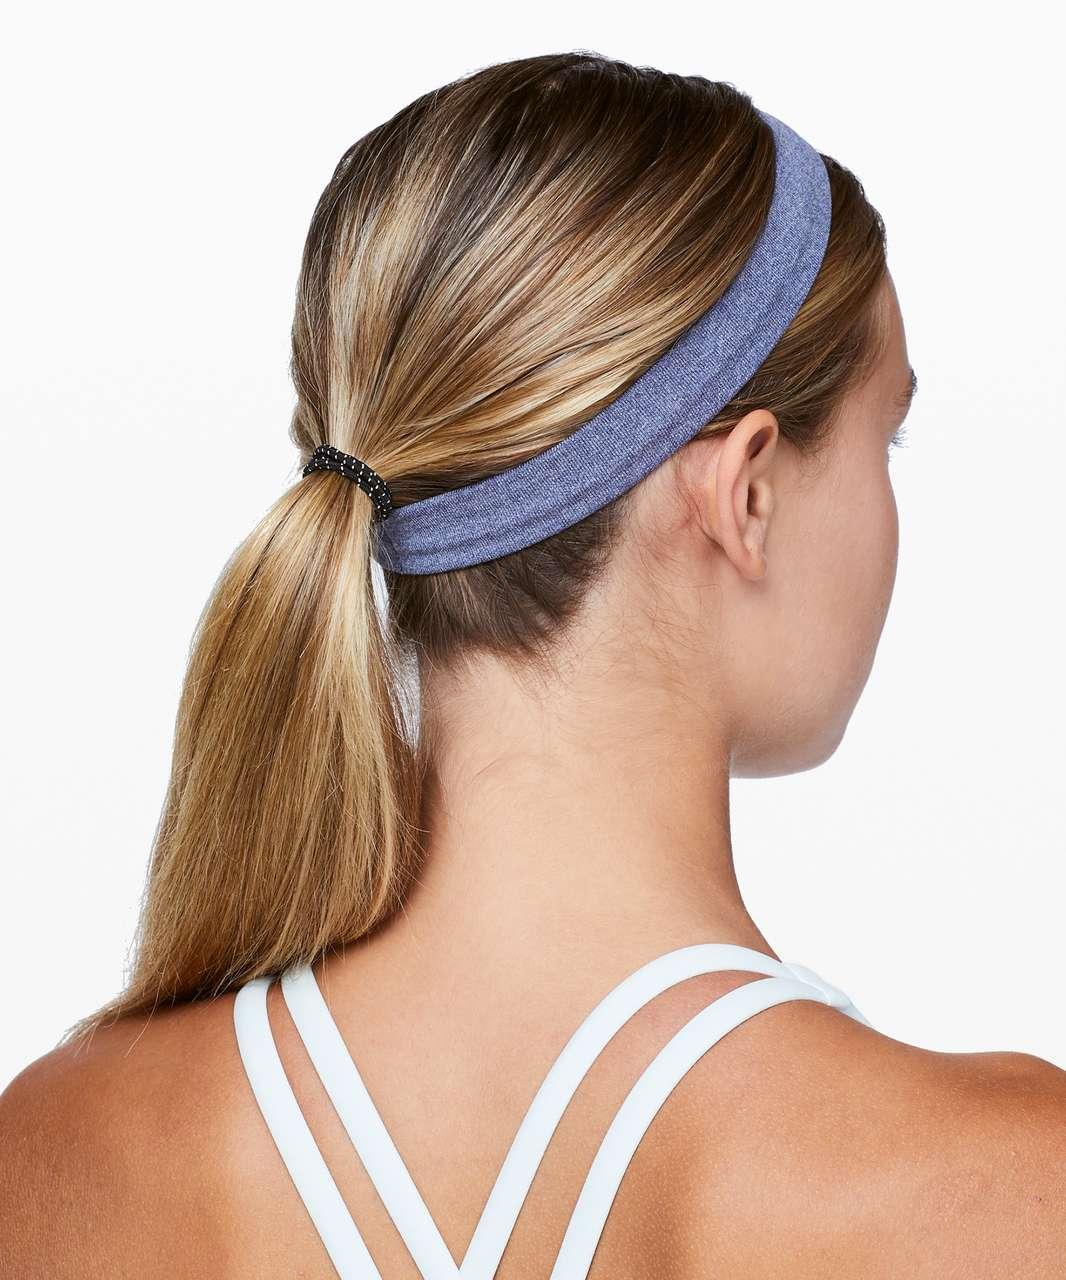 Lululemon Cardio Cross Trainer Headband - Deep Navy / White